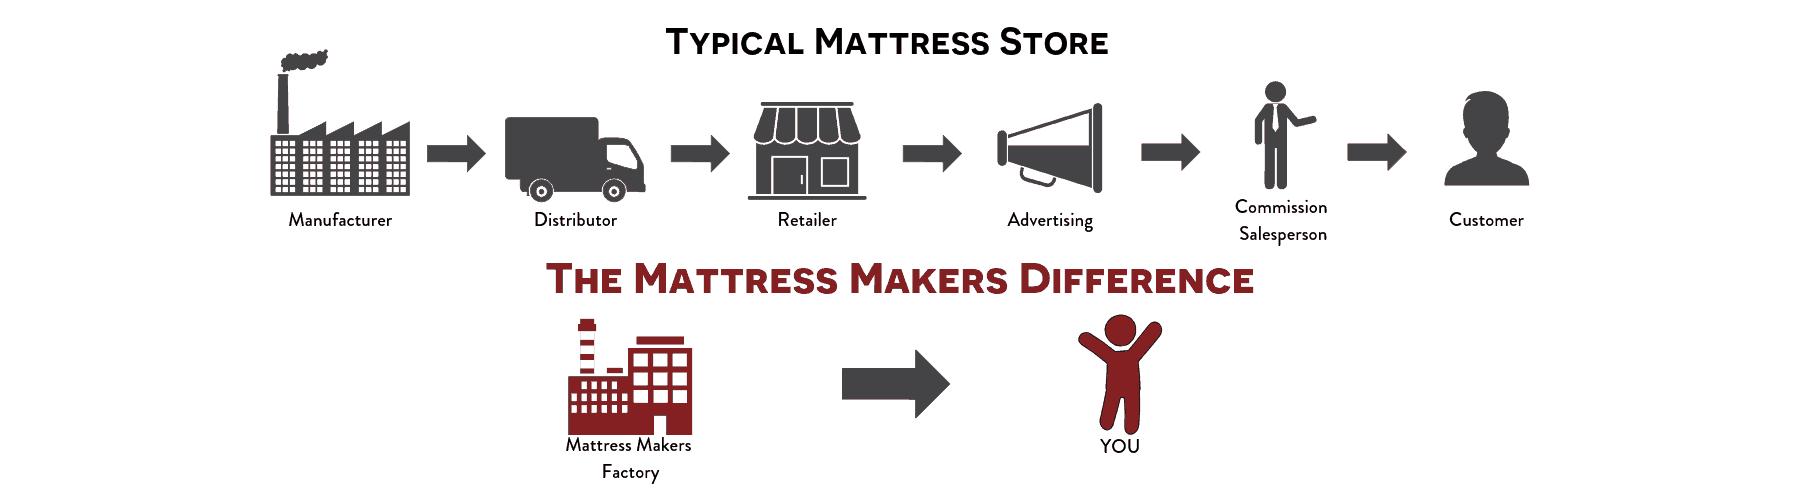 Typical Mattress Store (1)